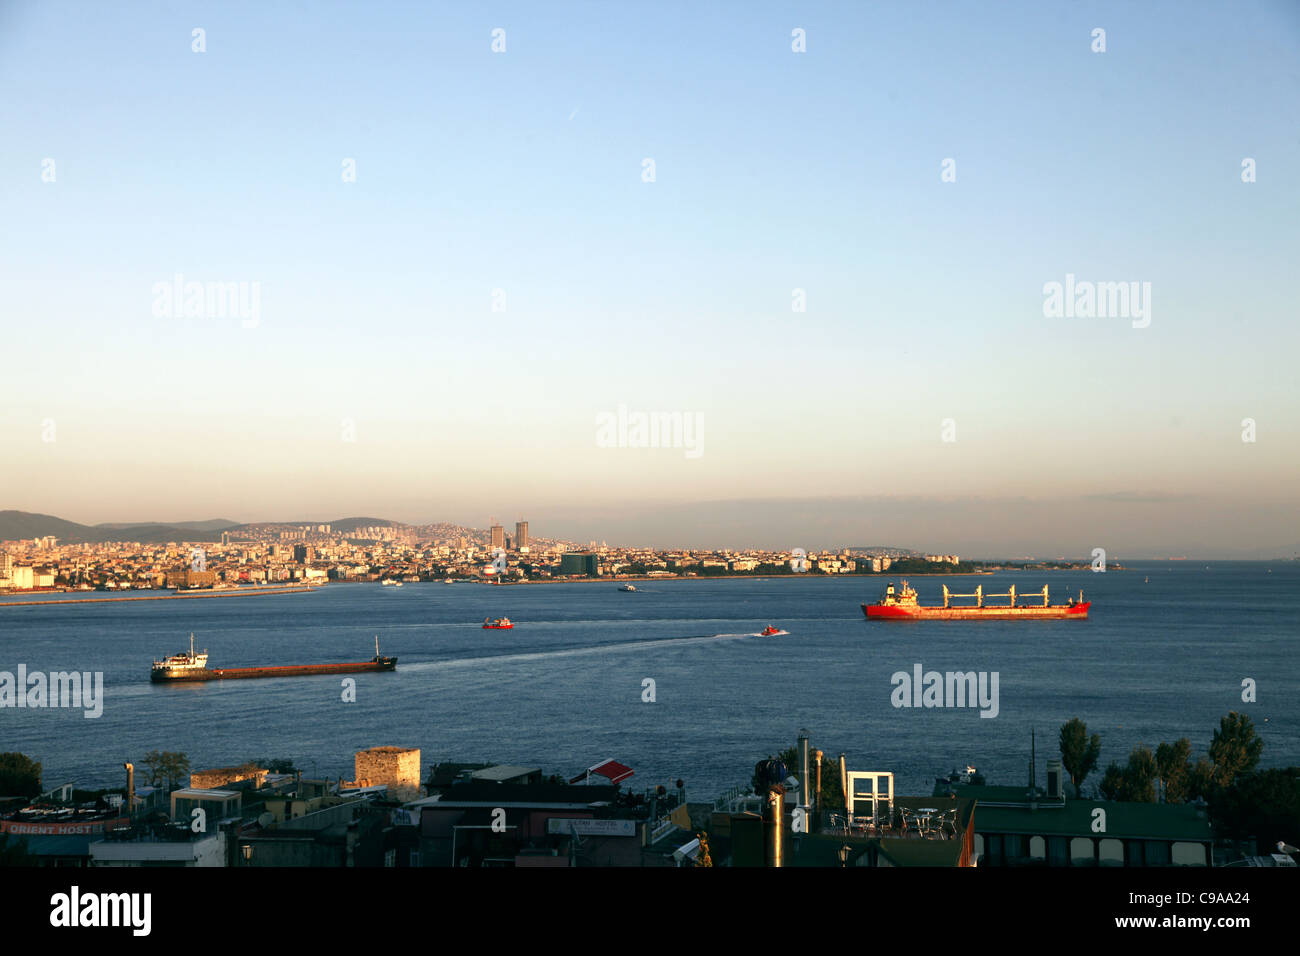 ROTEN ÖLTANKER am Bosporus TAKSIM-ISTANBUL-Türkei 3. Oktober 2011 Stockfoto